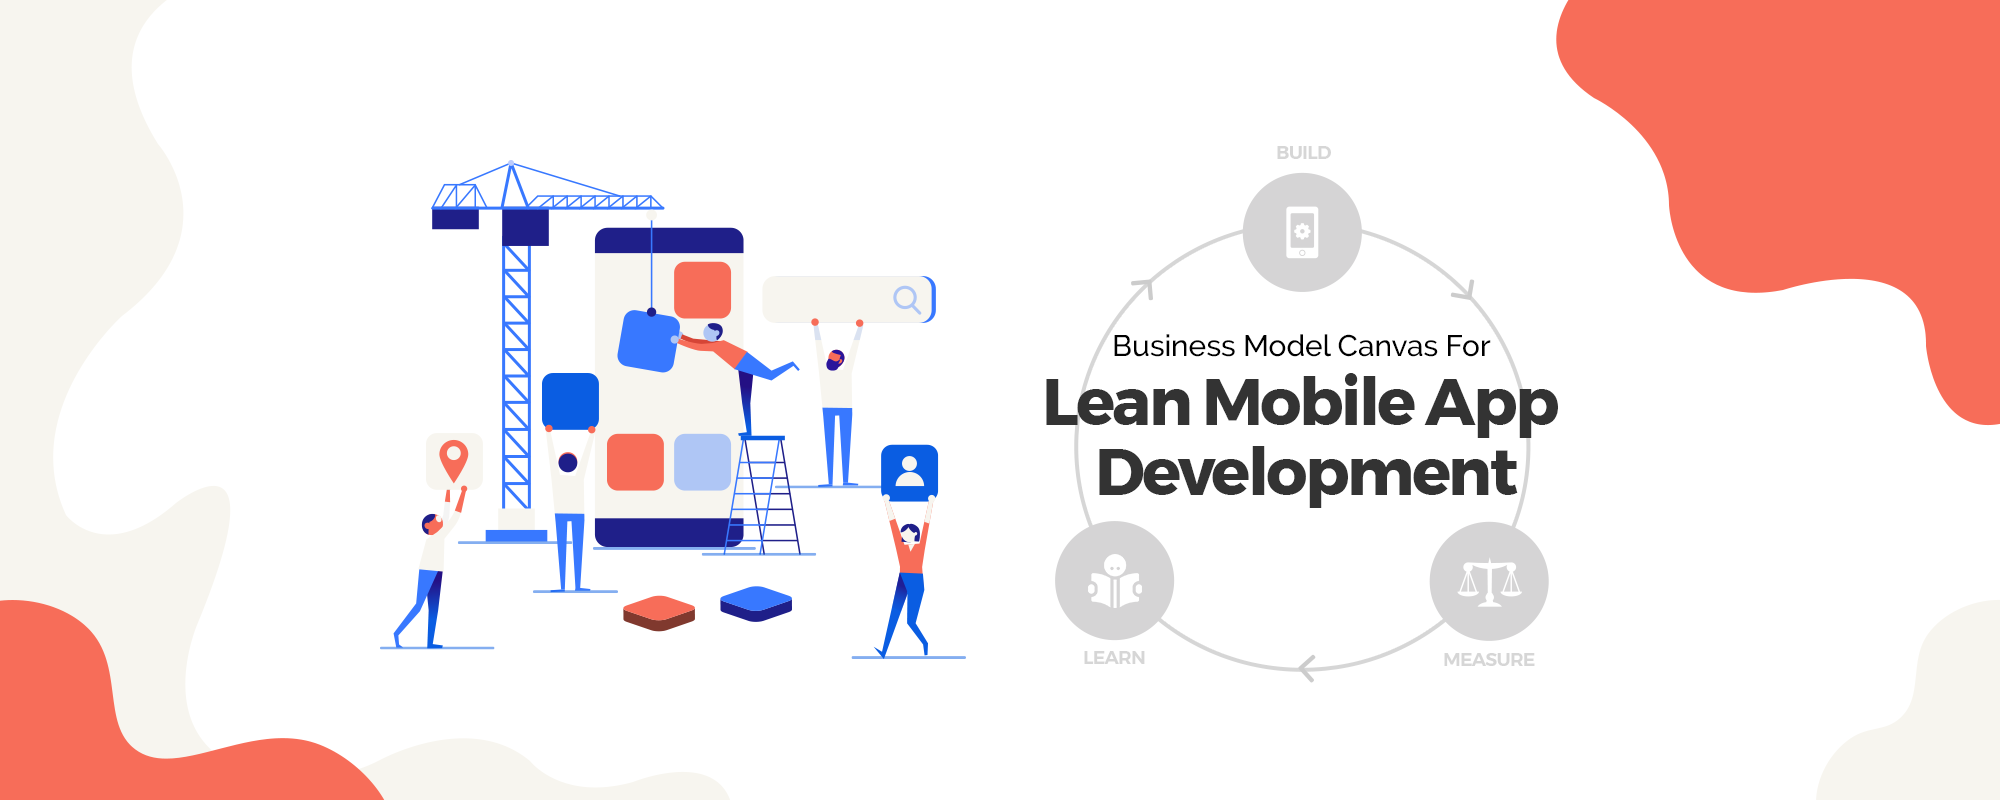 Business Model Canvas for Lean Mobile App Development